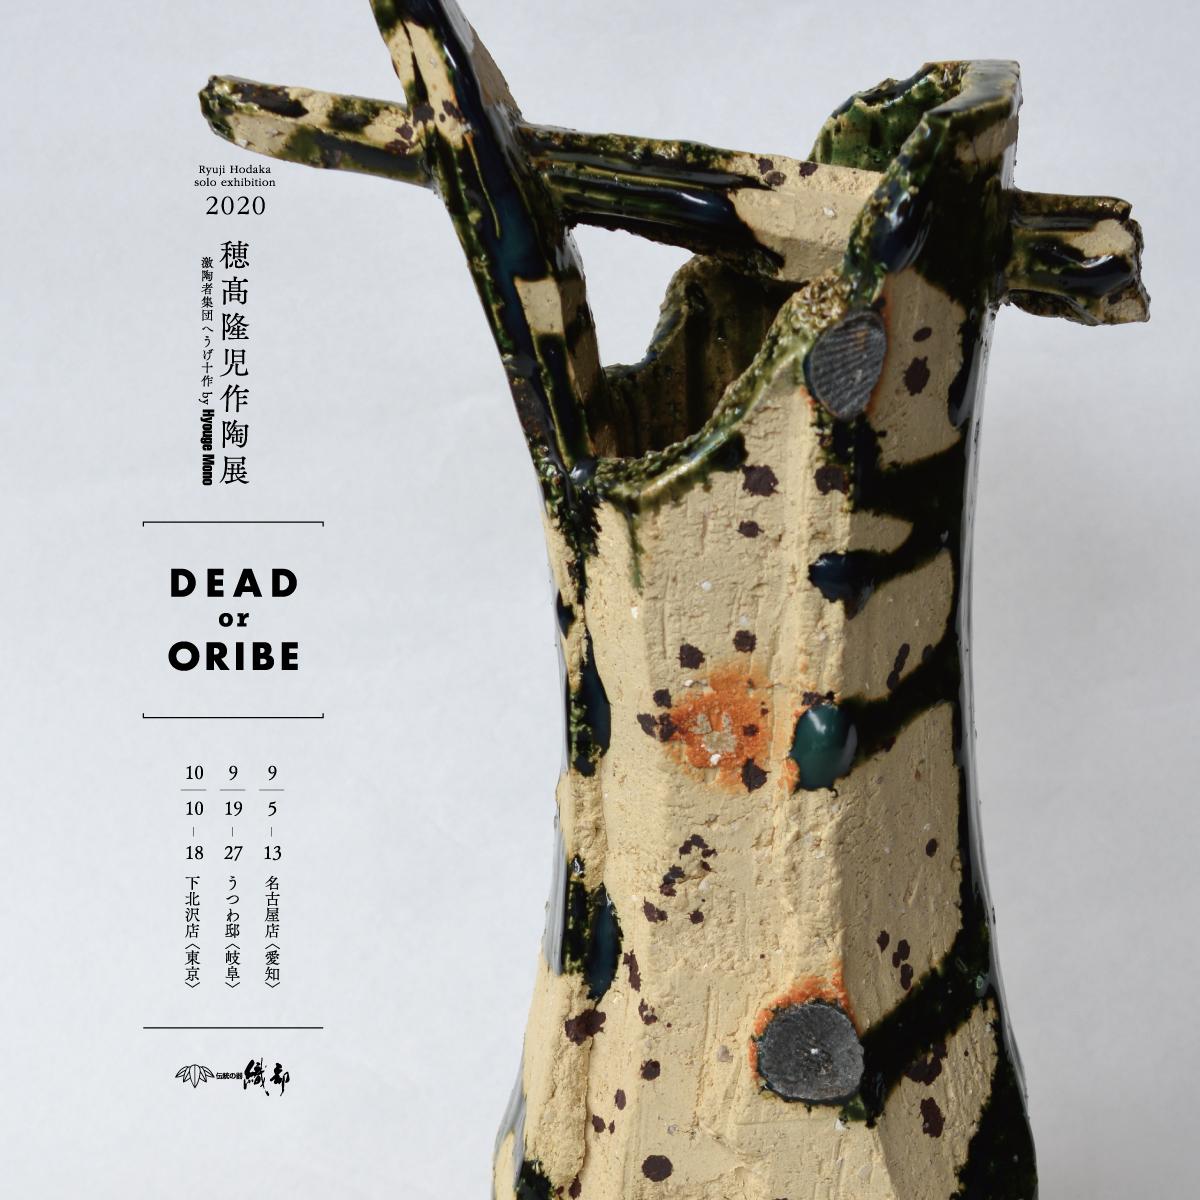 穂髙隆児作陶展『DEAD or ORIBE』